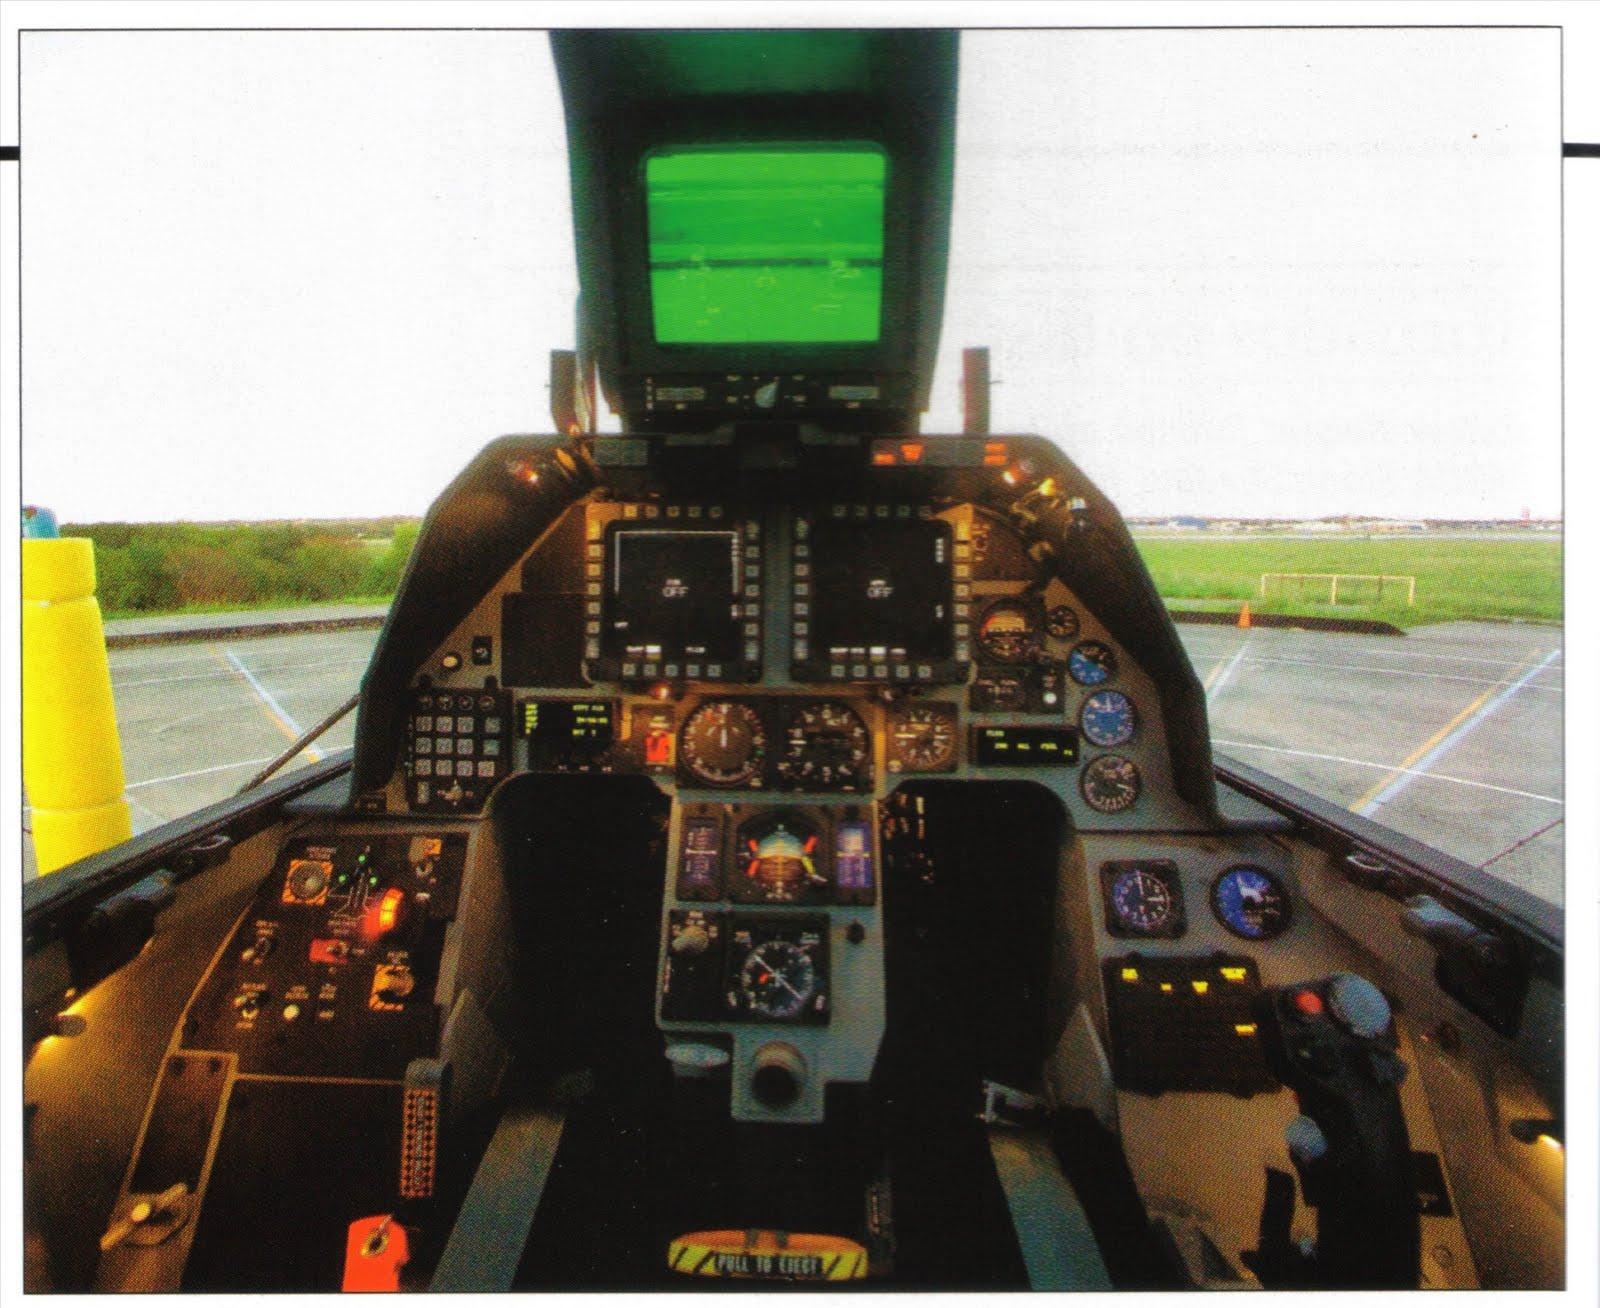 http://1.bp.blogspot.com/-3f0n4SvoOOc/Tkj5oBugfVI/AAAAAAAAKrE/ihGmH47XC_Y/s1600/Sukhoi+Su-30MKI+Cockpit+%25286%2529.jpg